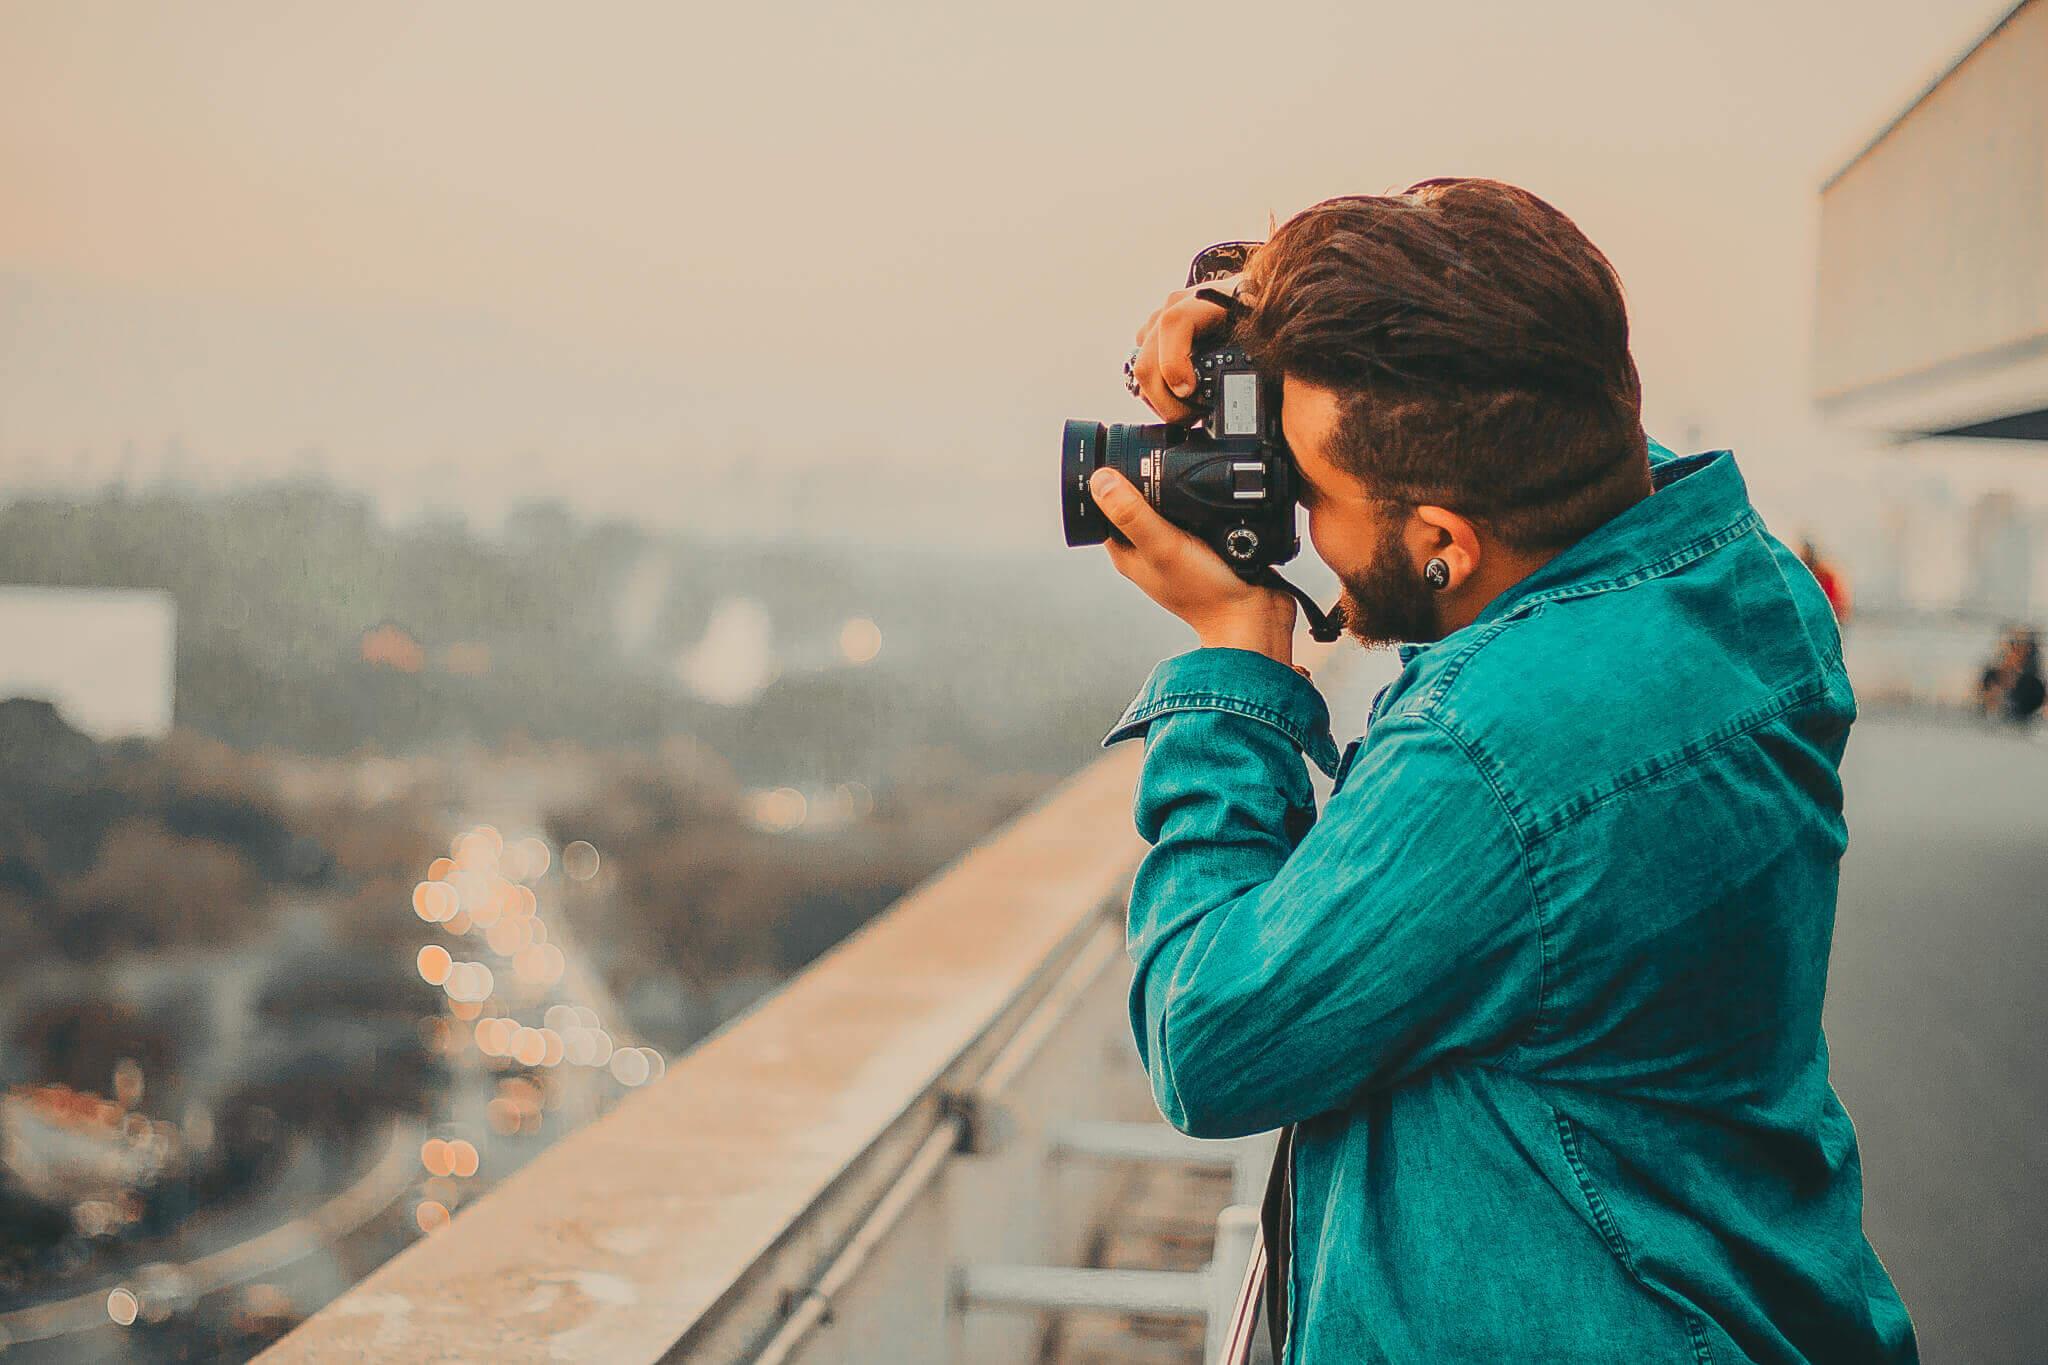 fotografas-fotoaparatas-nuotrauka-peizazas.jpeg